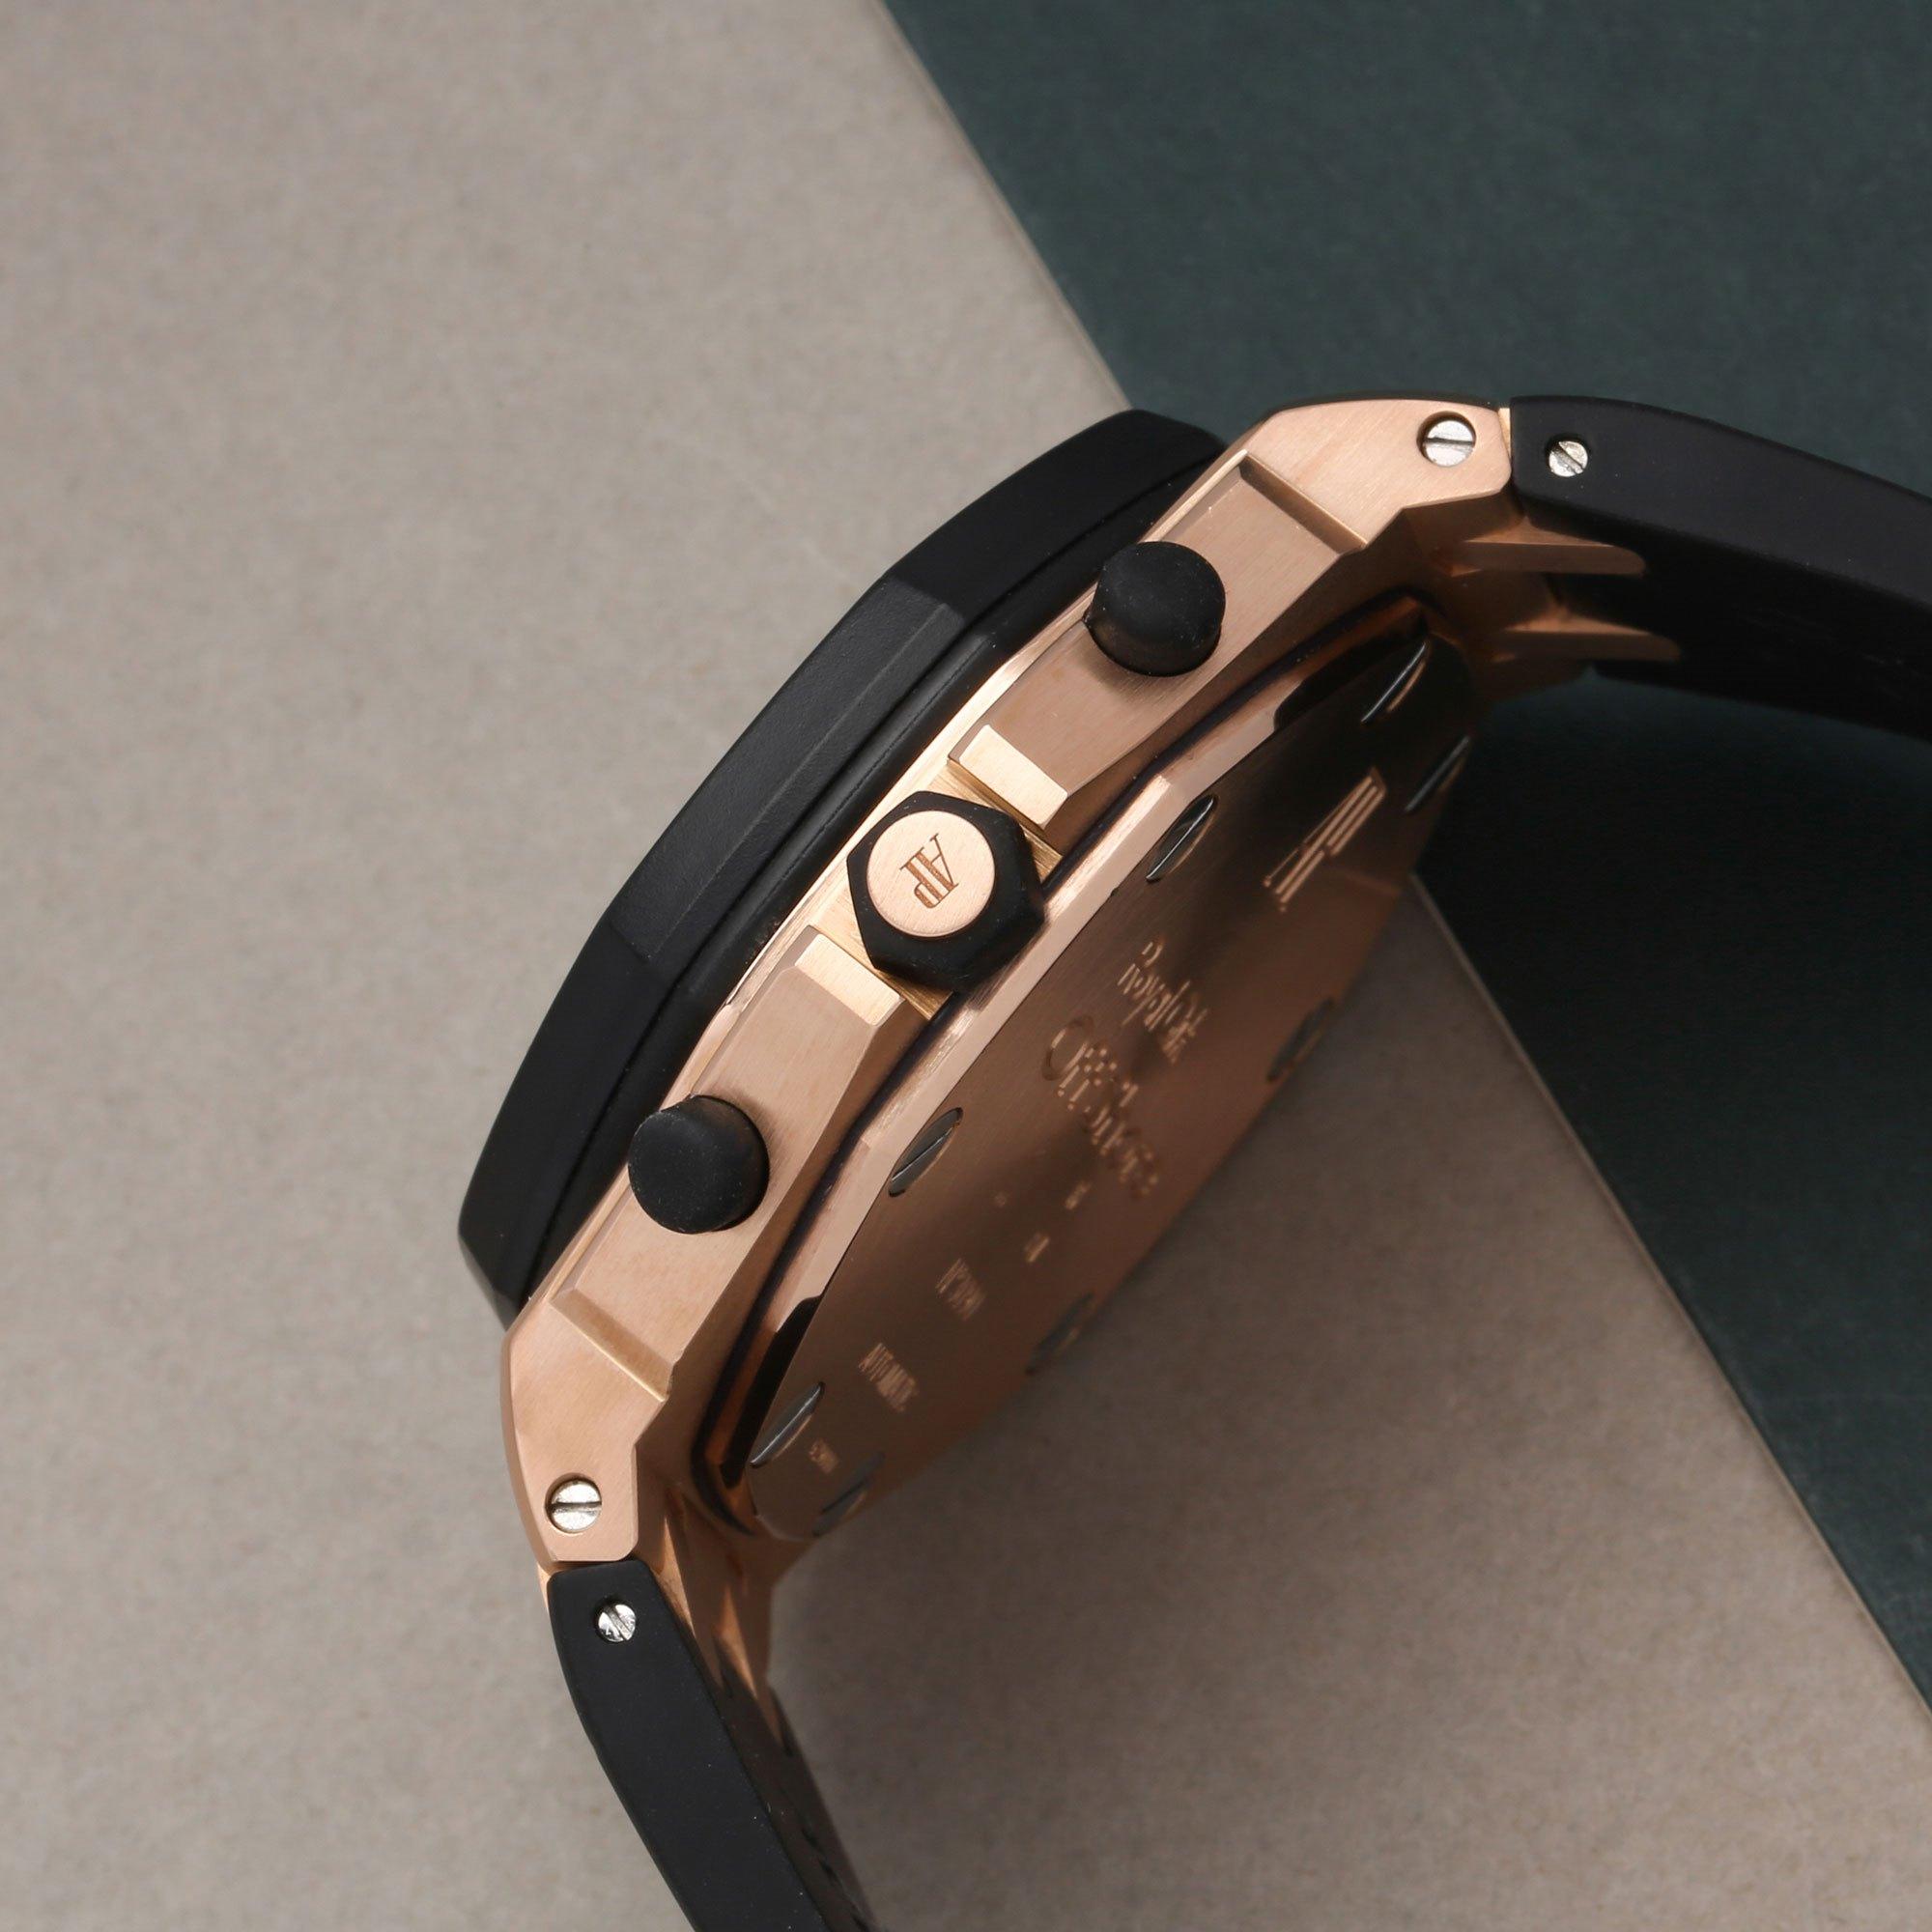 Audemars Piguet Royal Oak Offshore Chronograph Rubber Clad 18K Rose Gold 25940OK.OO.D002CA.01.A